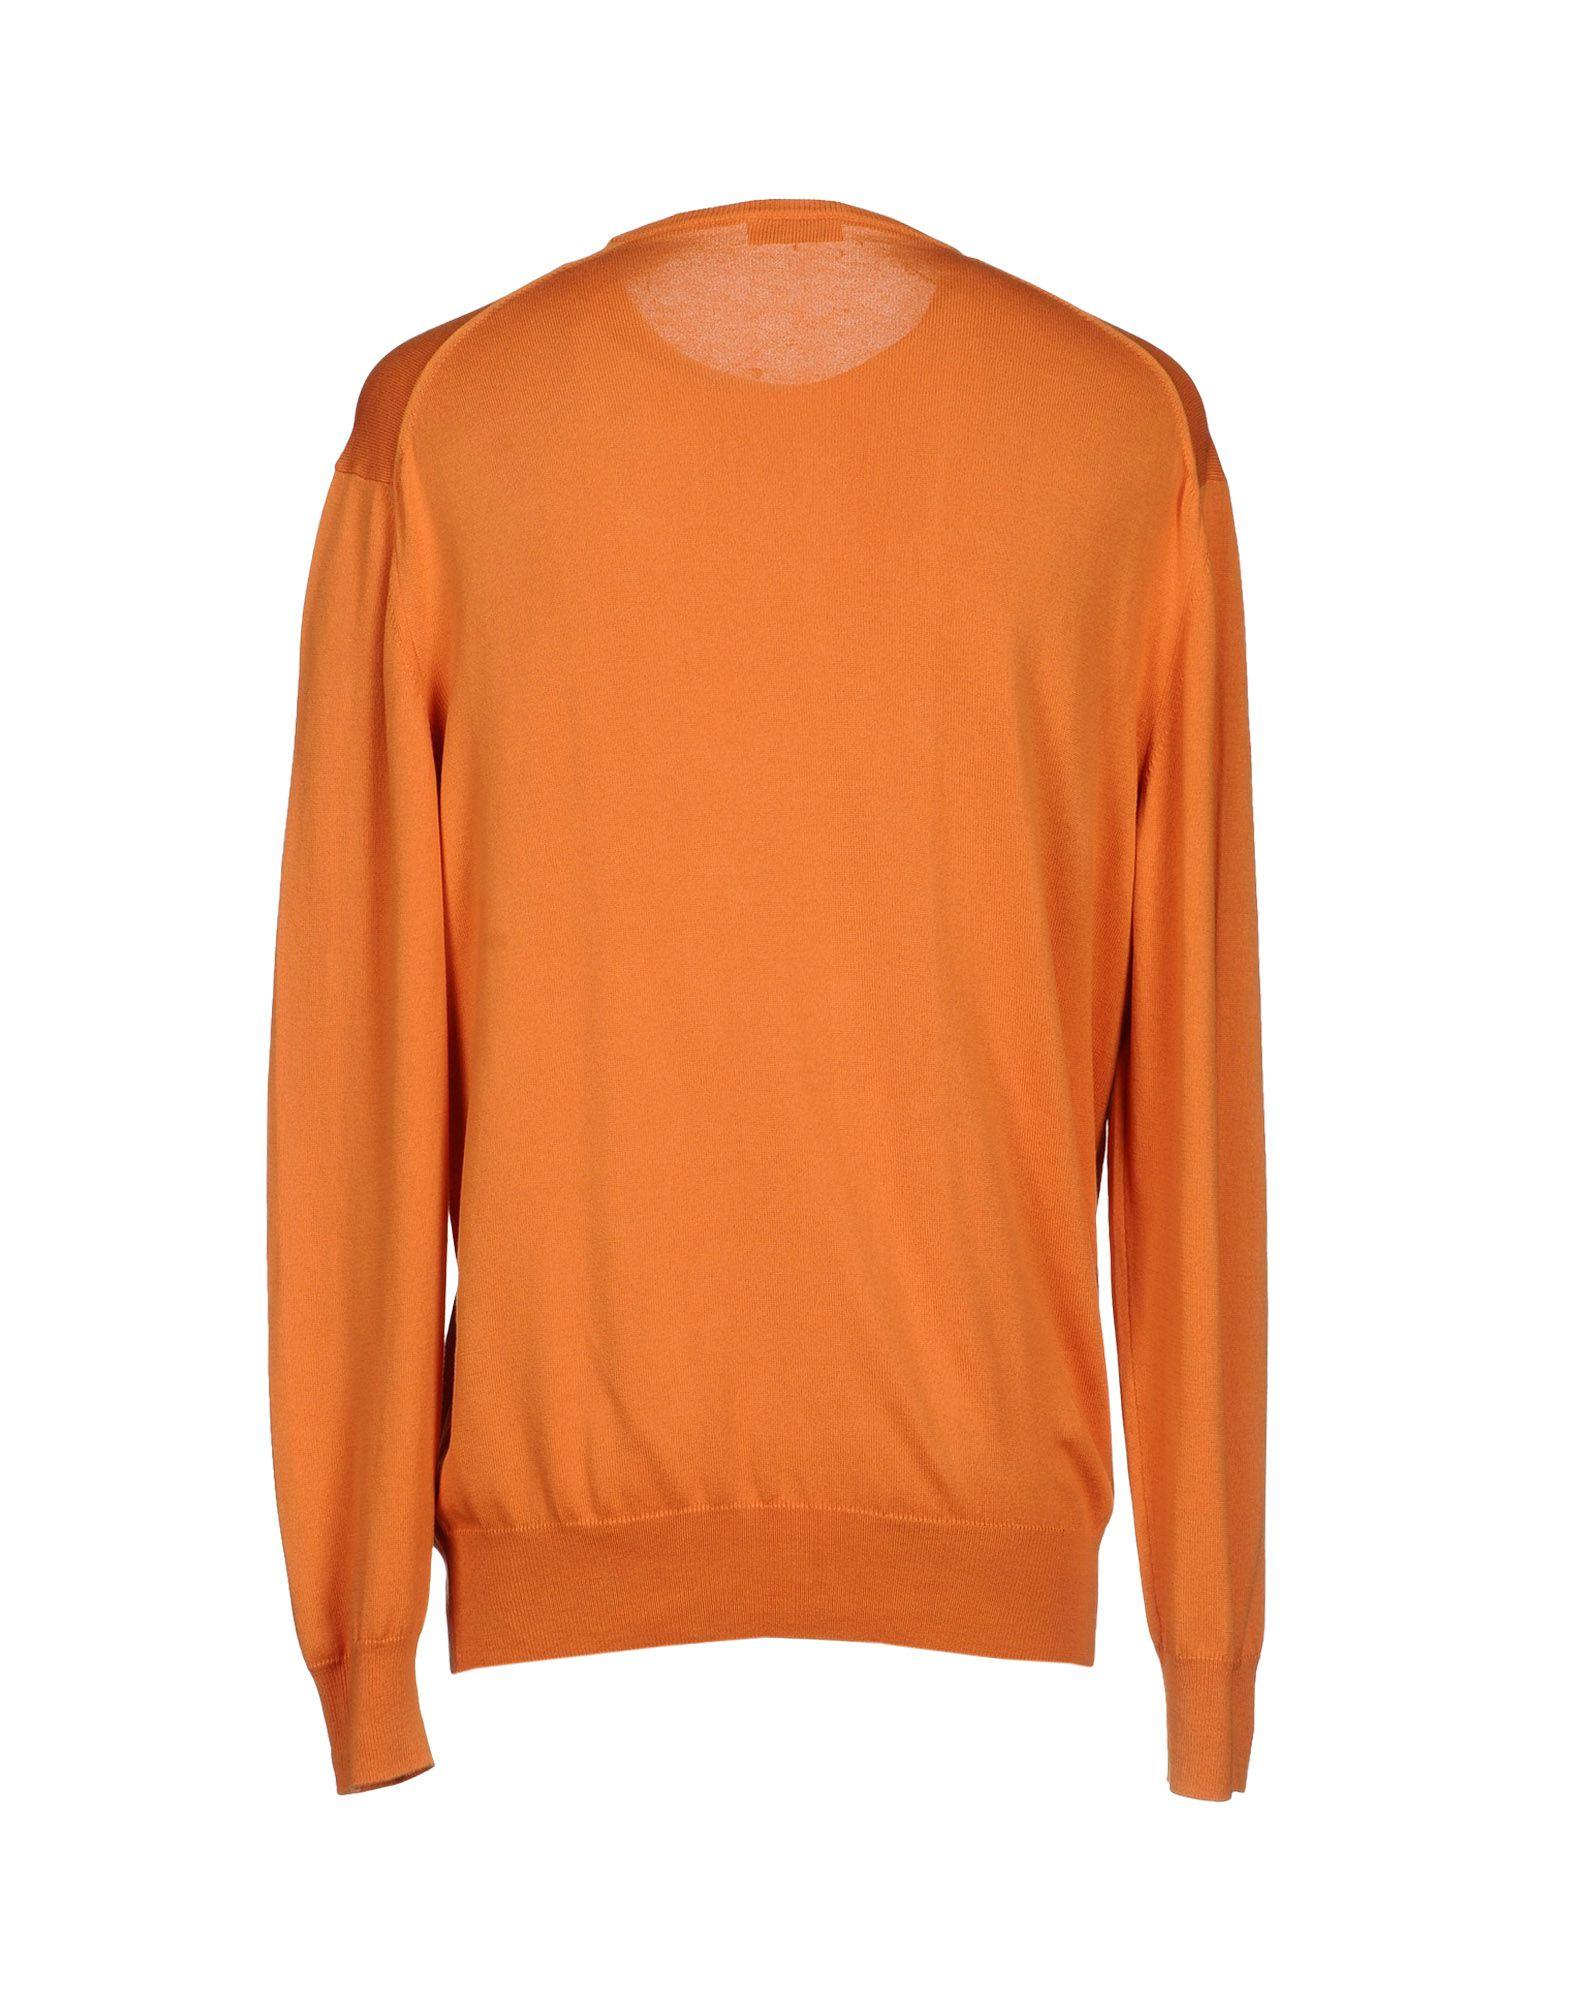 2b7a1e056 Aiezen Ribbed Polo Neck Sweater